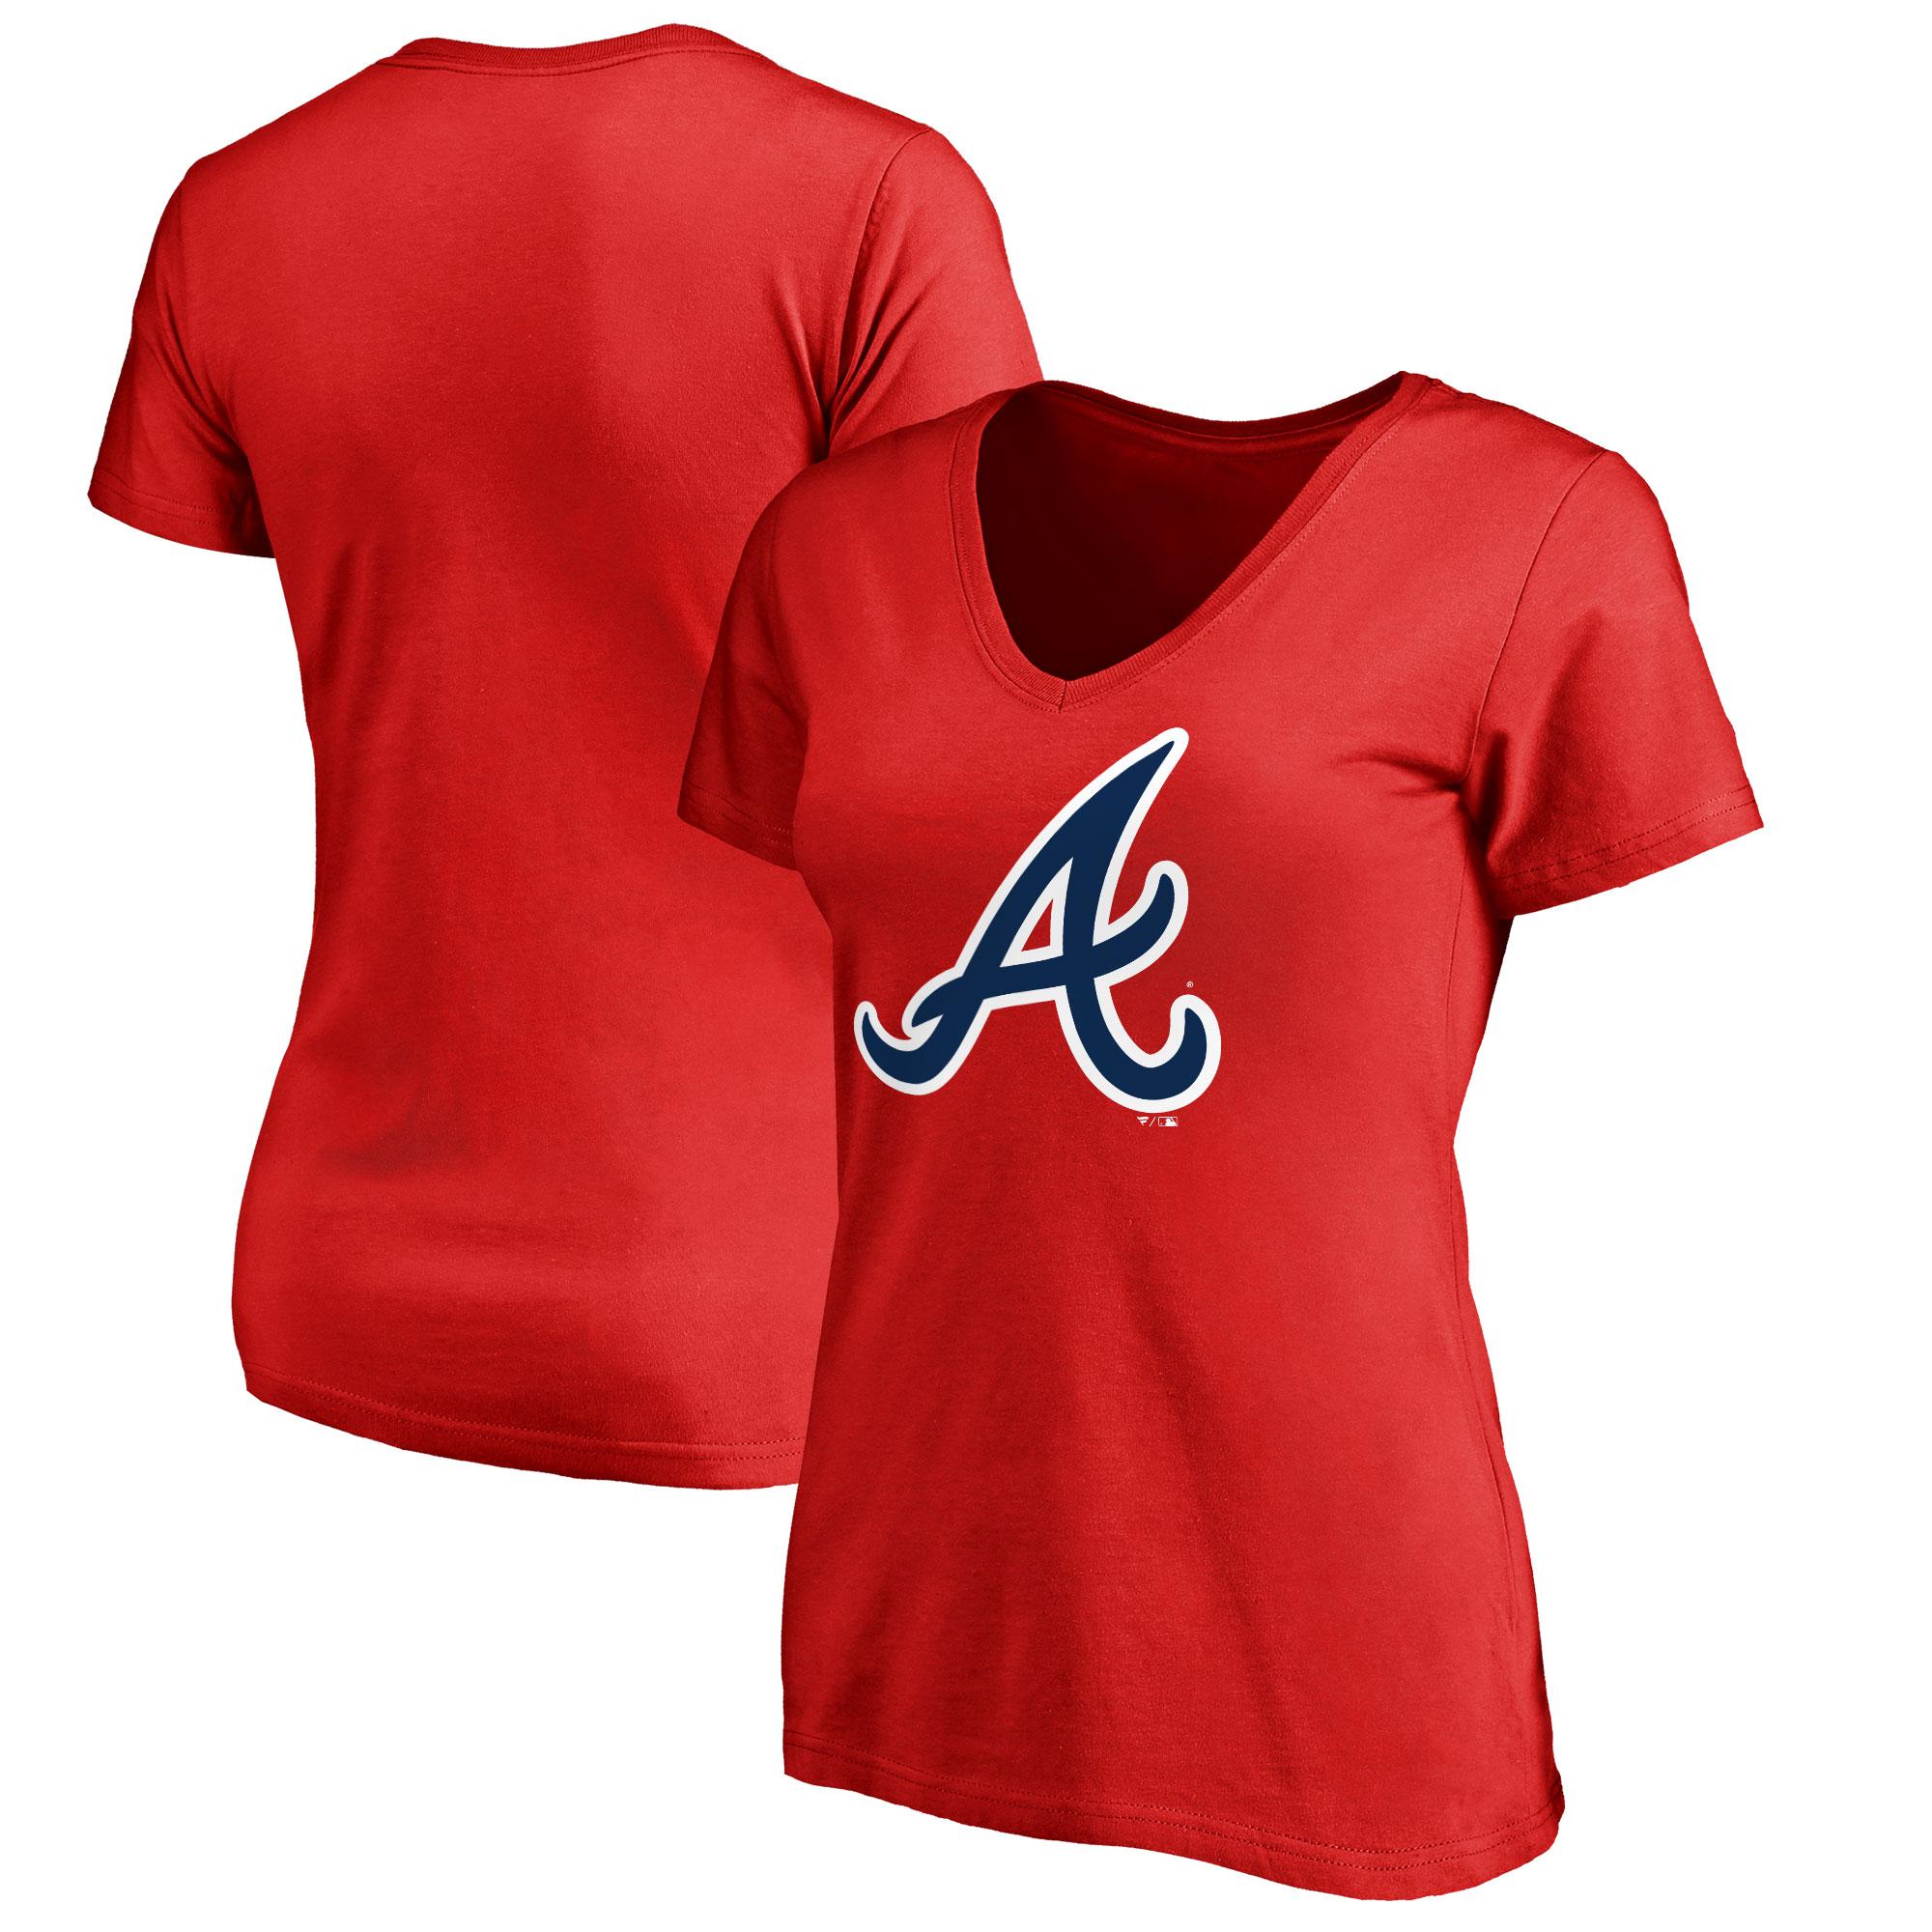 Atlanta Braves Women's Plus Sizes Primary Team Logo T-Shirt - Red